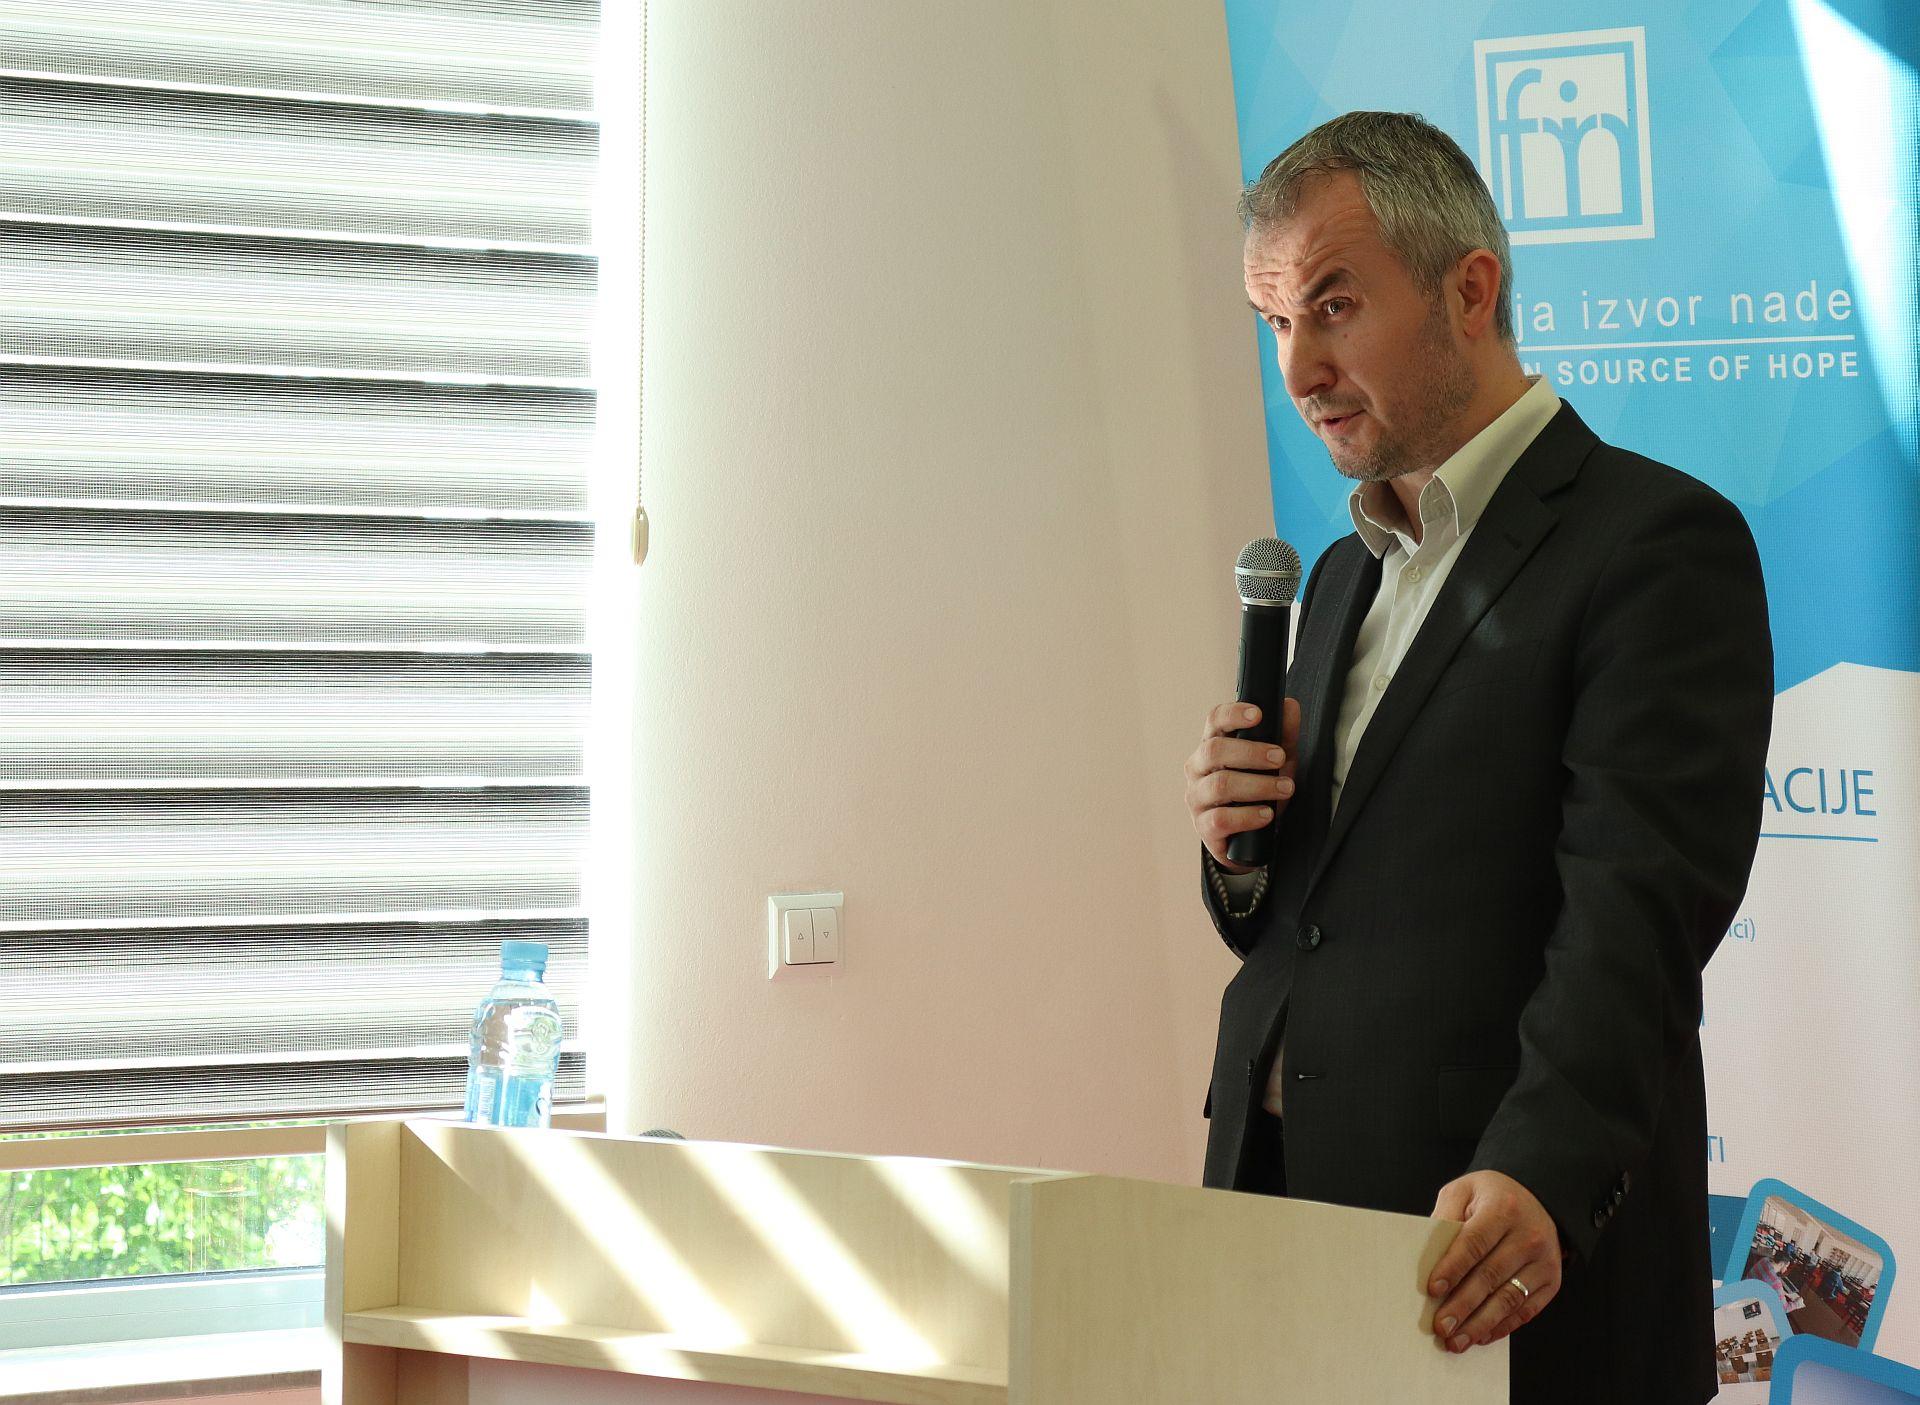 Stud. dom Prof. dr. Fikret Hadzic Sarajevo_k